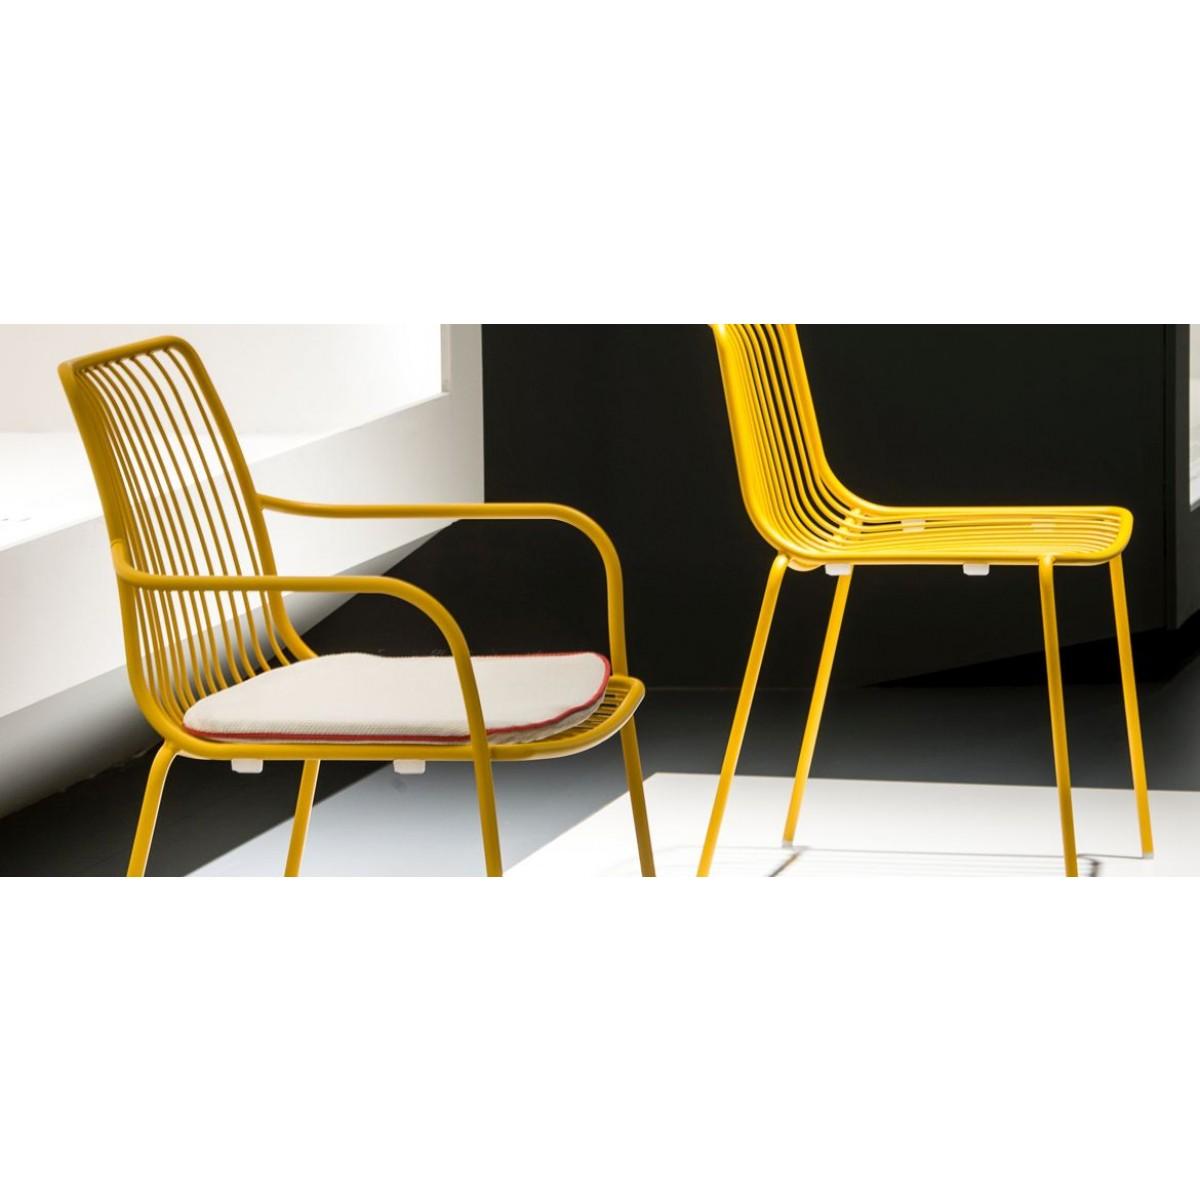 stuhl grau mit armlehne metall stapelbar gartenstuhl grau metall mit armlehne. Black Bedroom Furniture Sets. Home Design Ideas